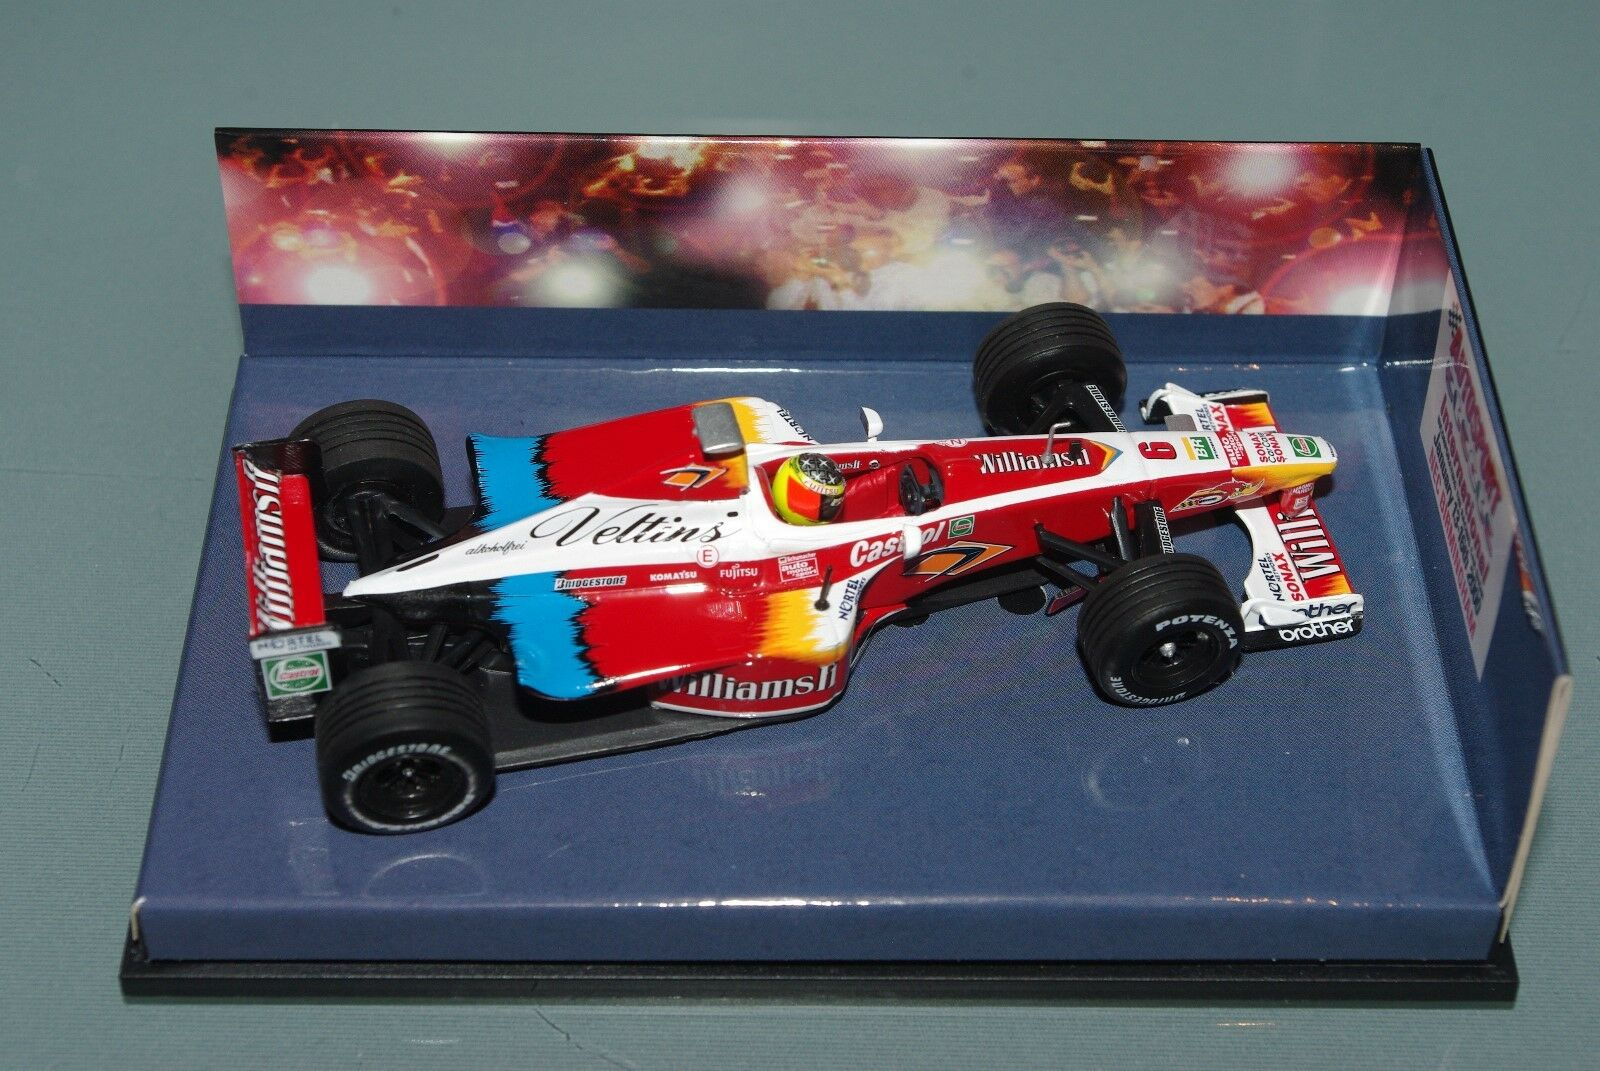 Minichamps F1 1 43 Williams Ralf Schumacher-Autosport súpertec FW21 Edition